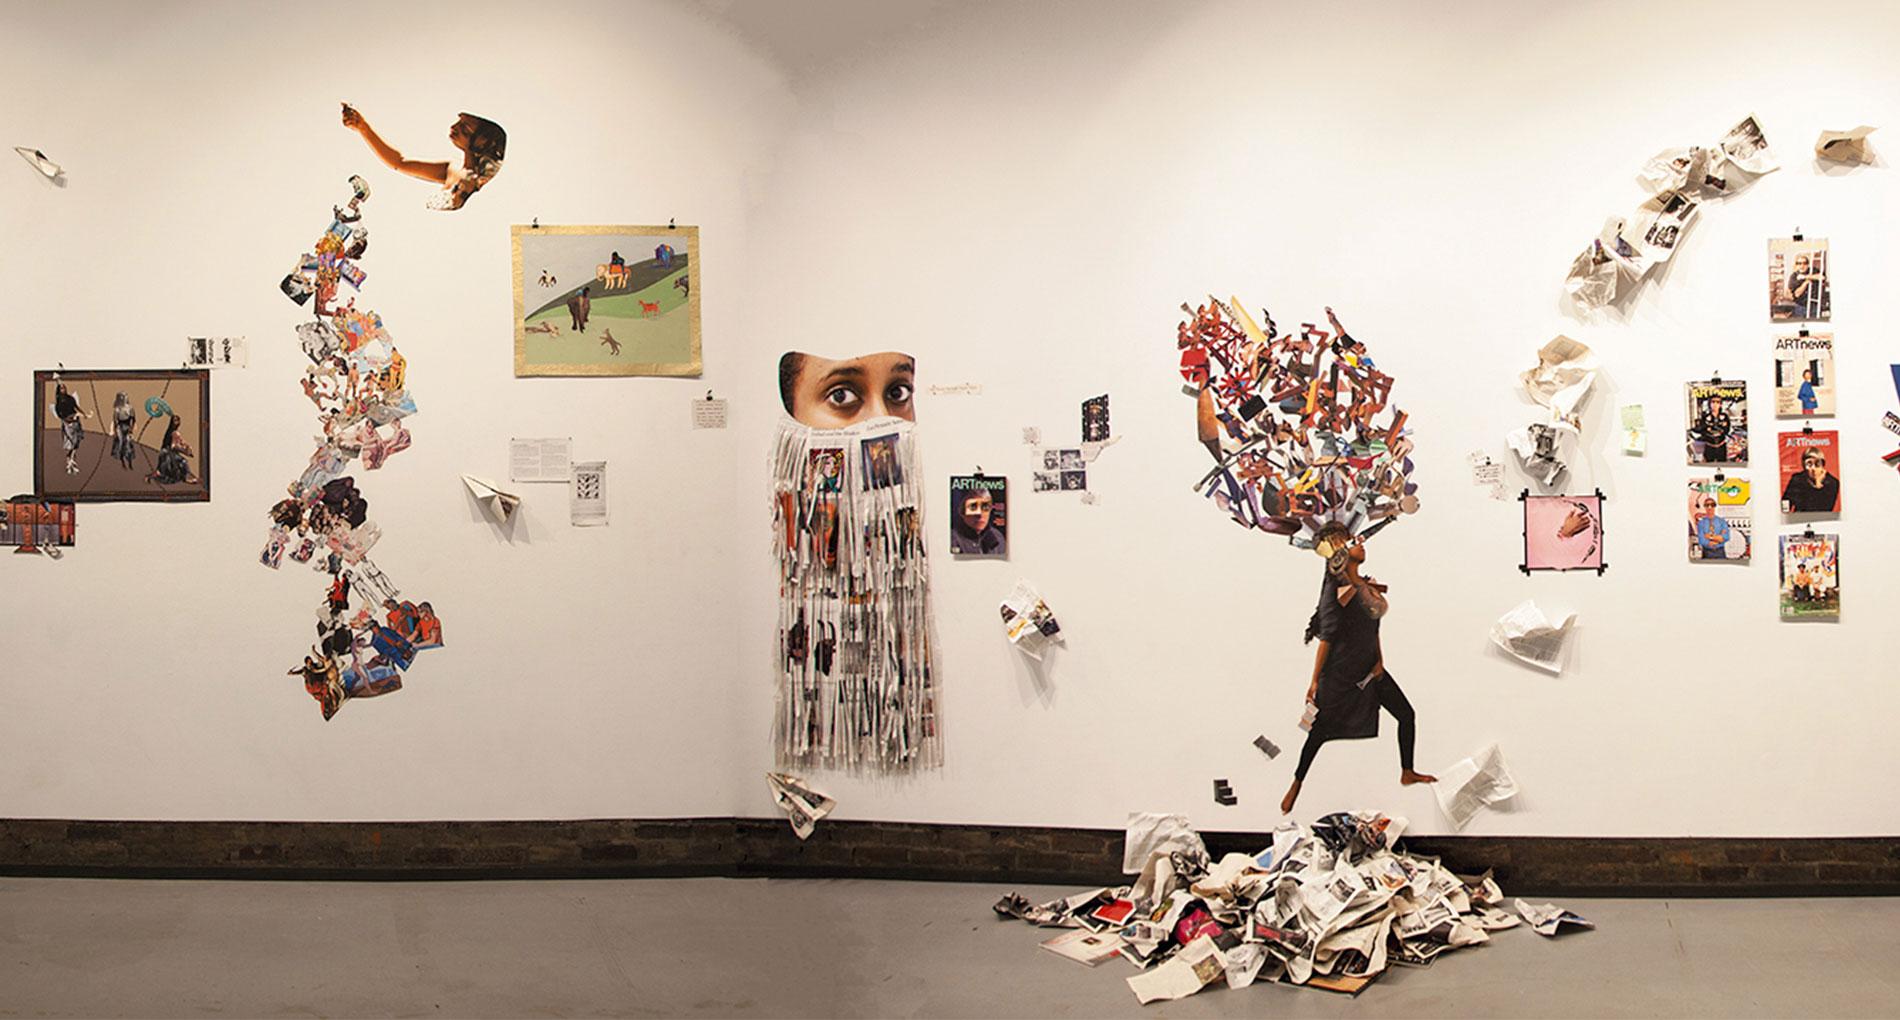 Critical Race Studies Program Examines Race Through Art